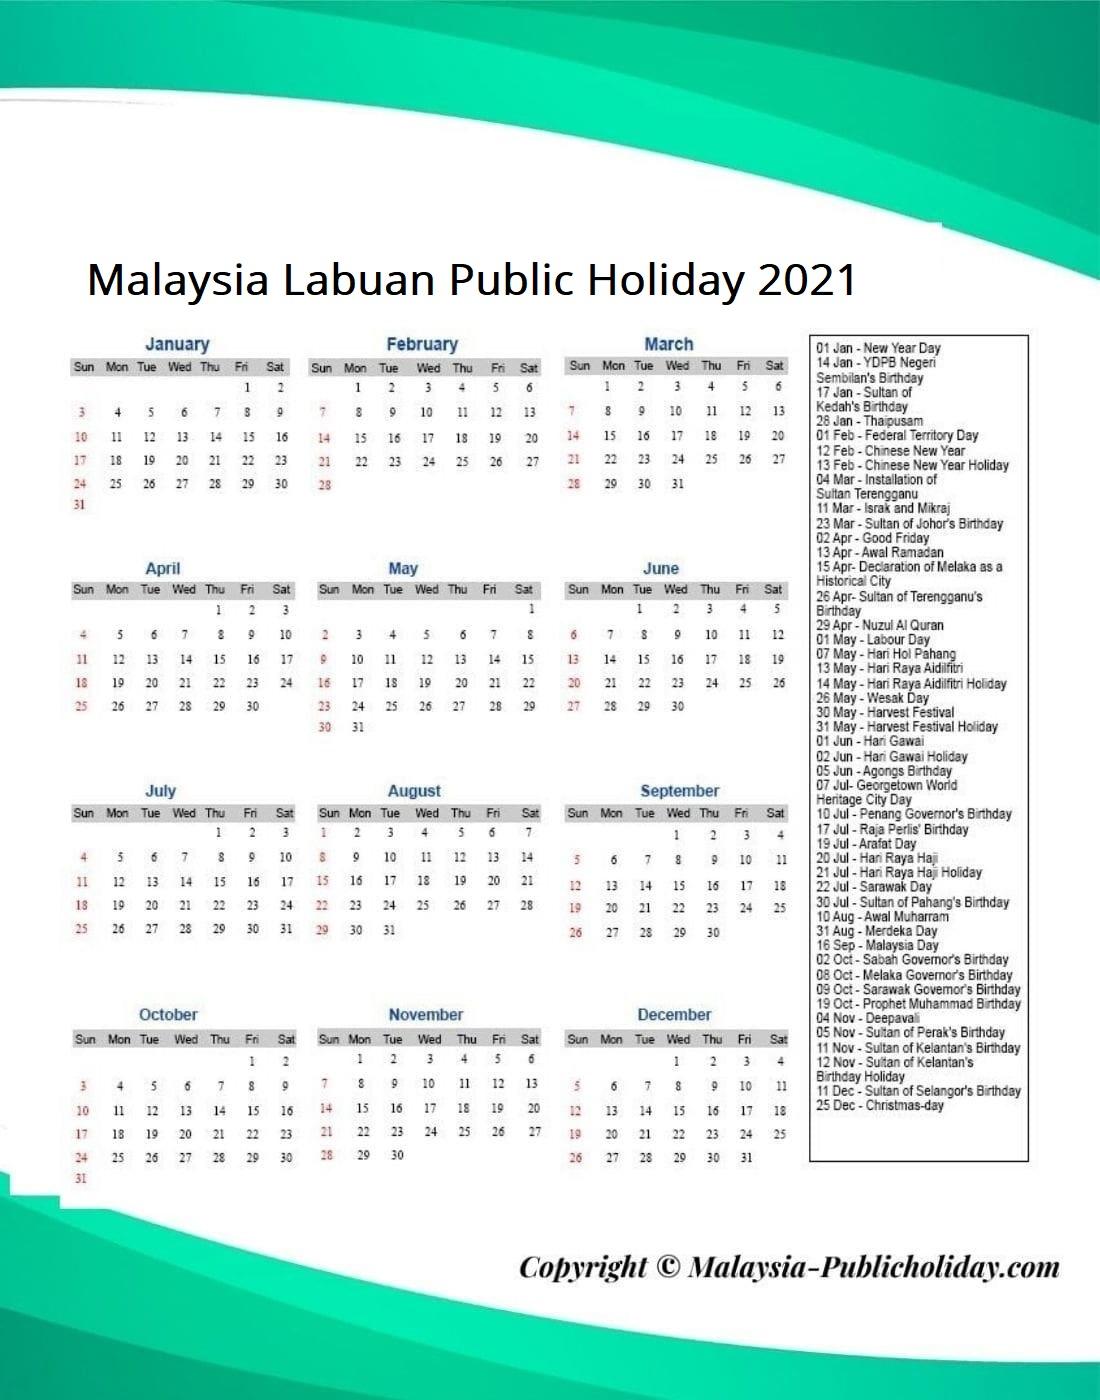 Labuan Public Holiday 2021